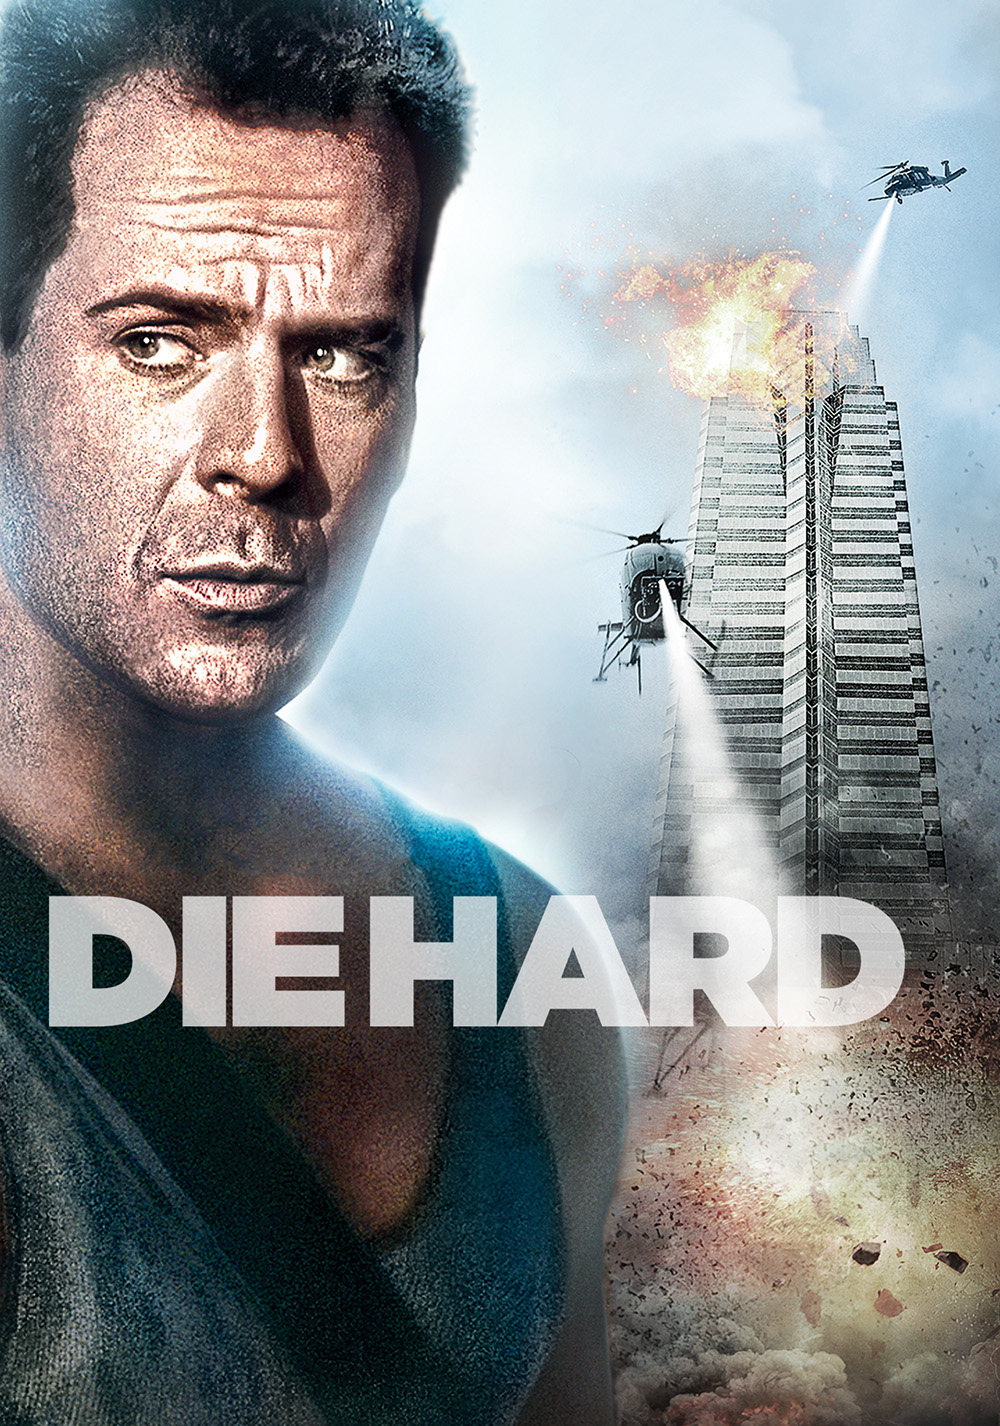 Die Hard | Movie fanart | fanart.tv